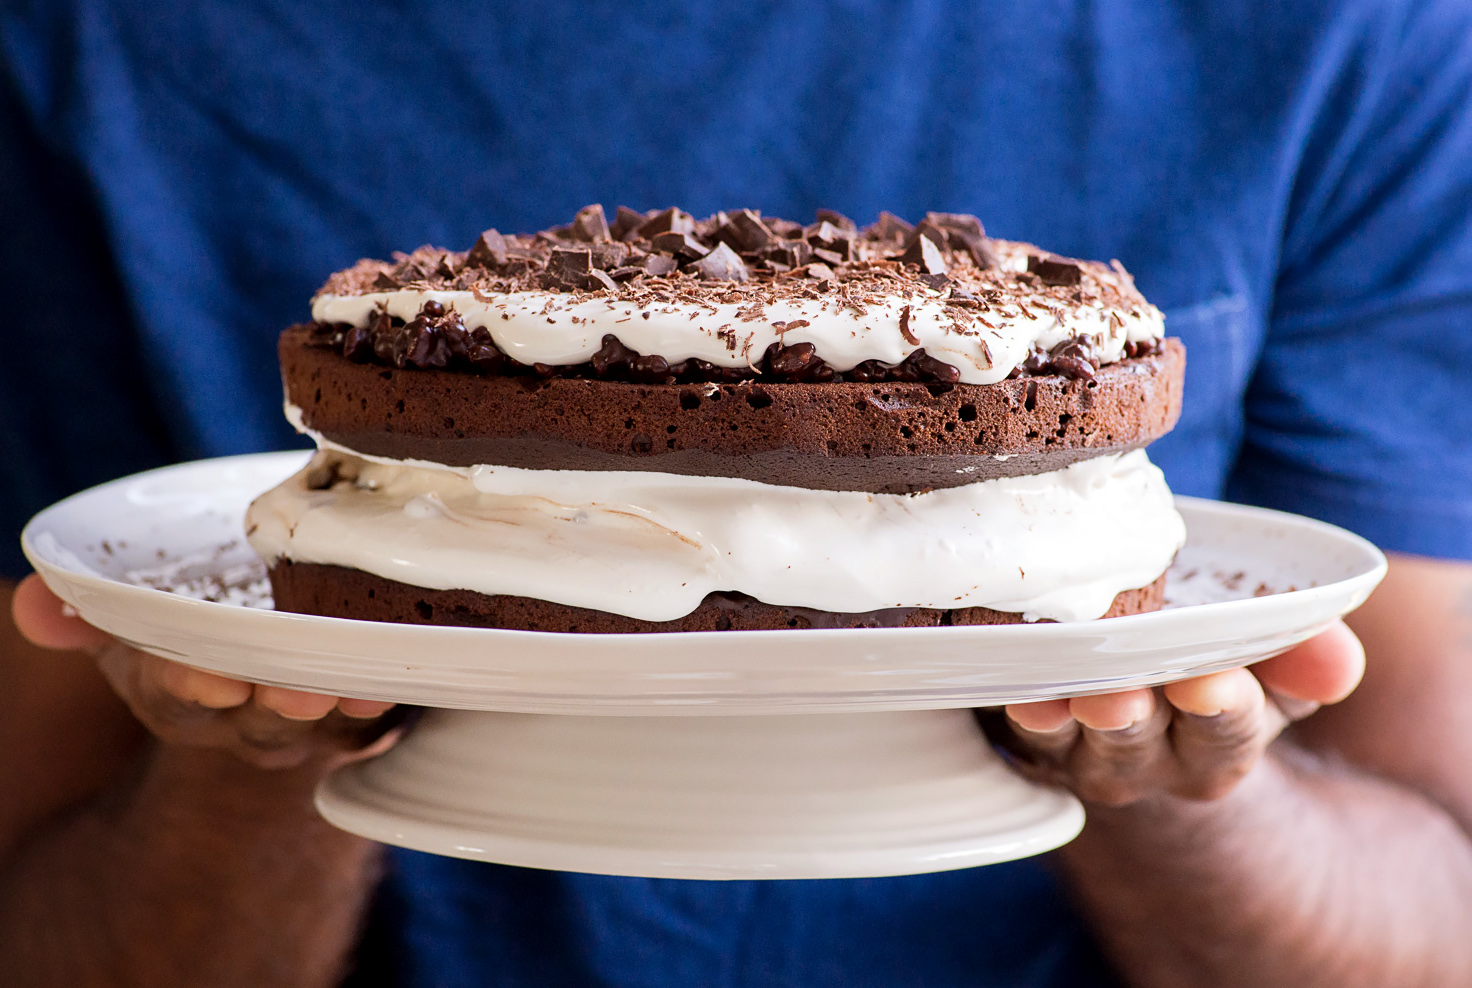 Chocolate Celebration Cake From Jamie Oliver Comfort Food